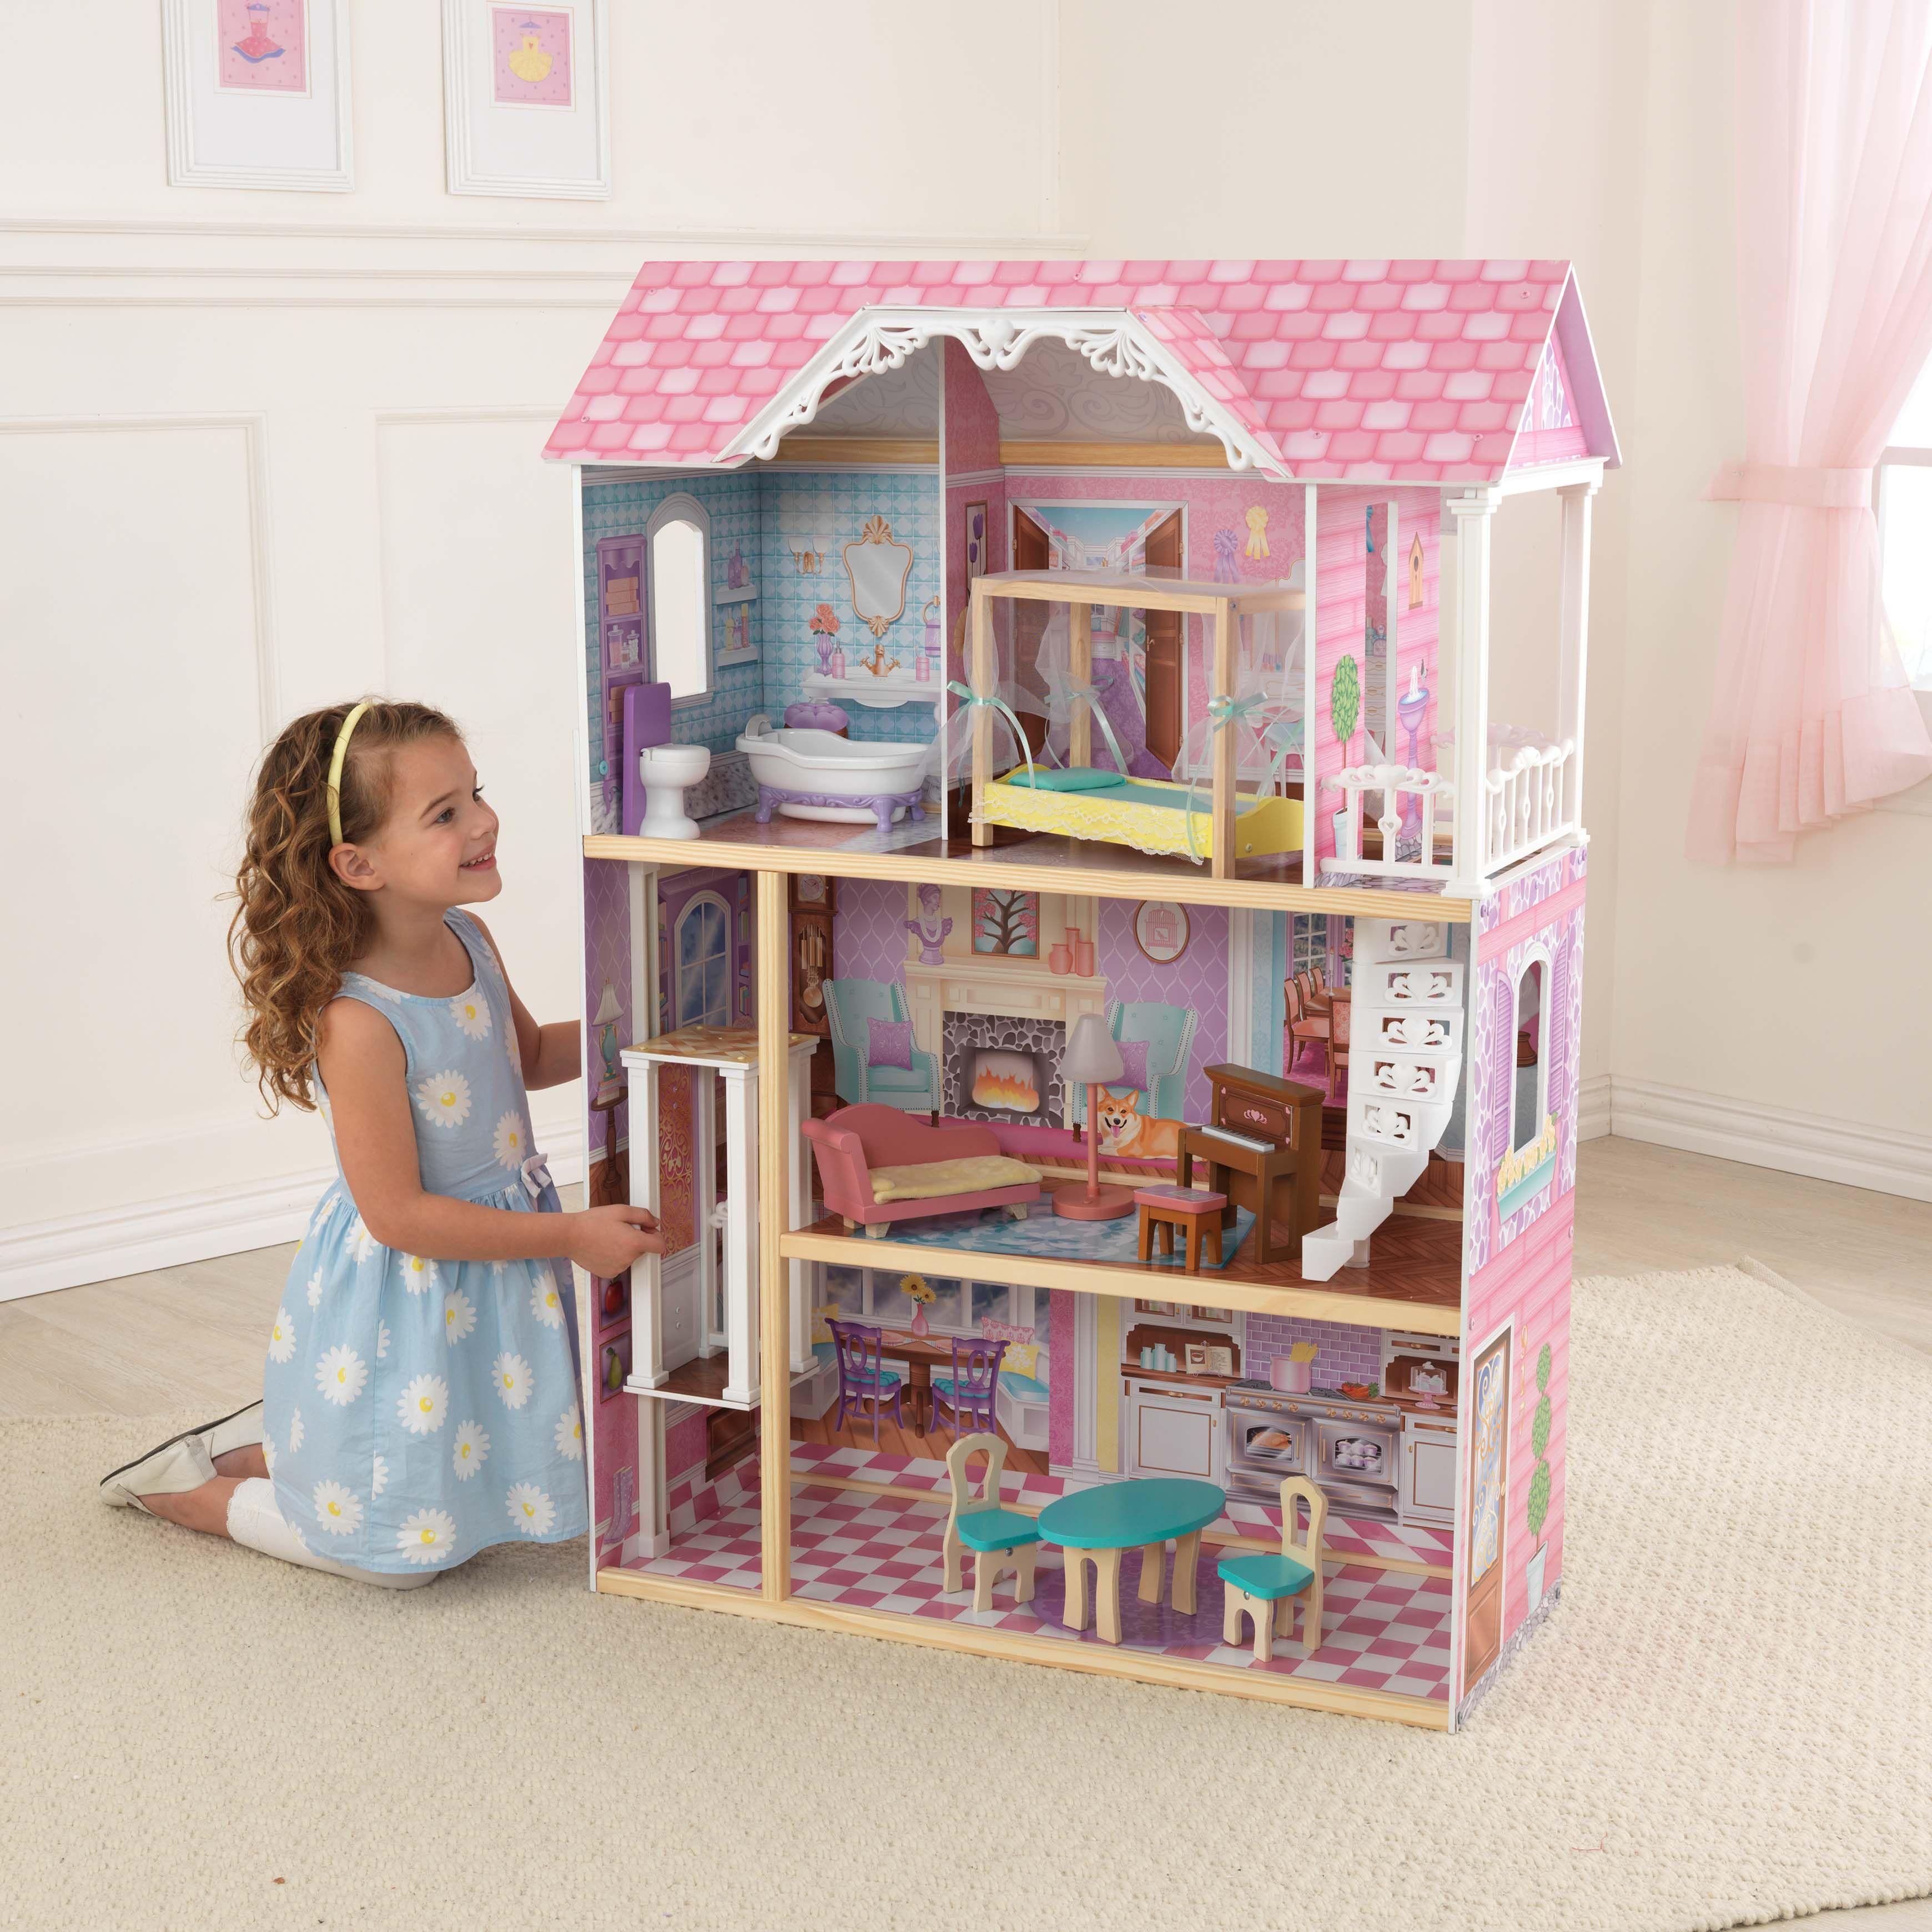 Charming Chateau Dollhouse Kidkraft Doll House Kids Furniture Wooden Dollhouse